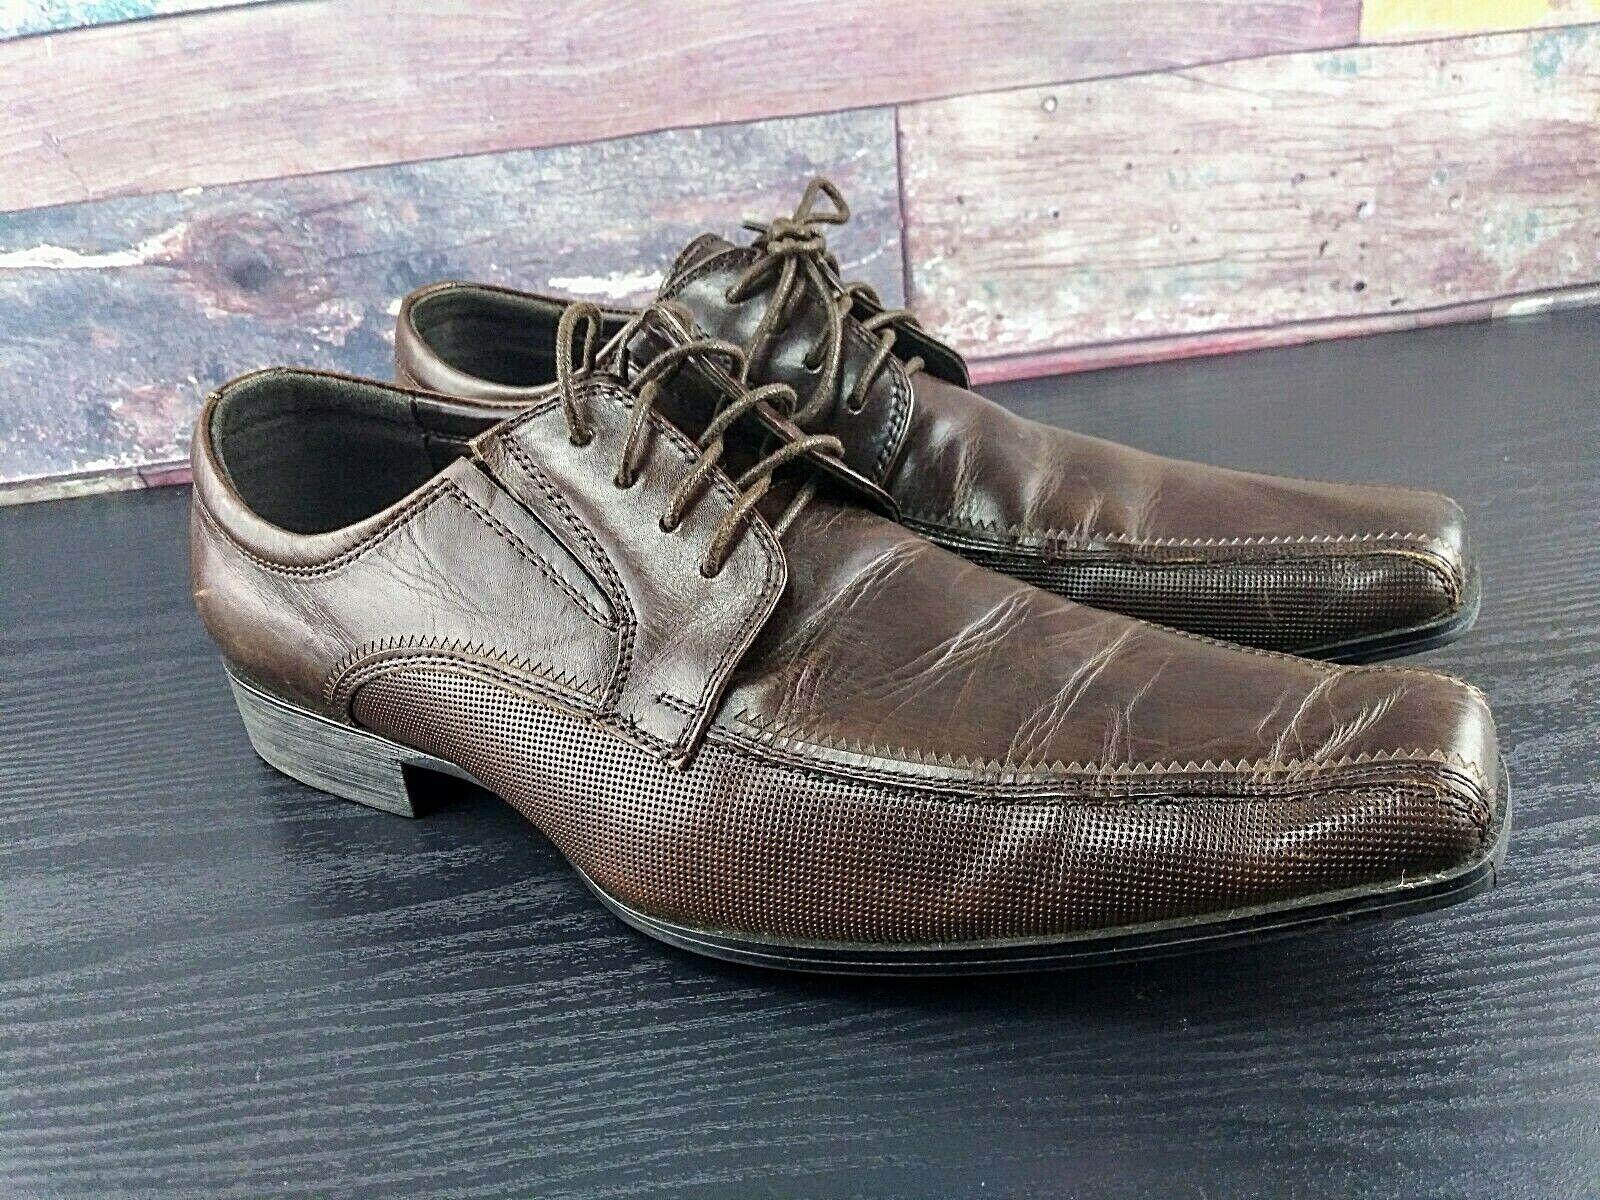 Mens Dress Shoes Kenneth Cole Reaction Size 10 M Brown Public Preview For Men